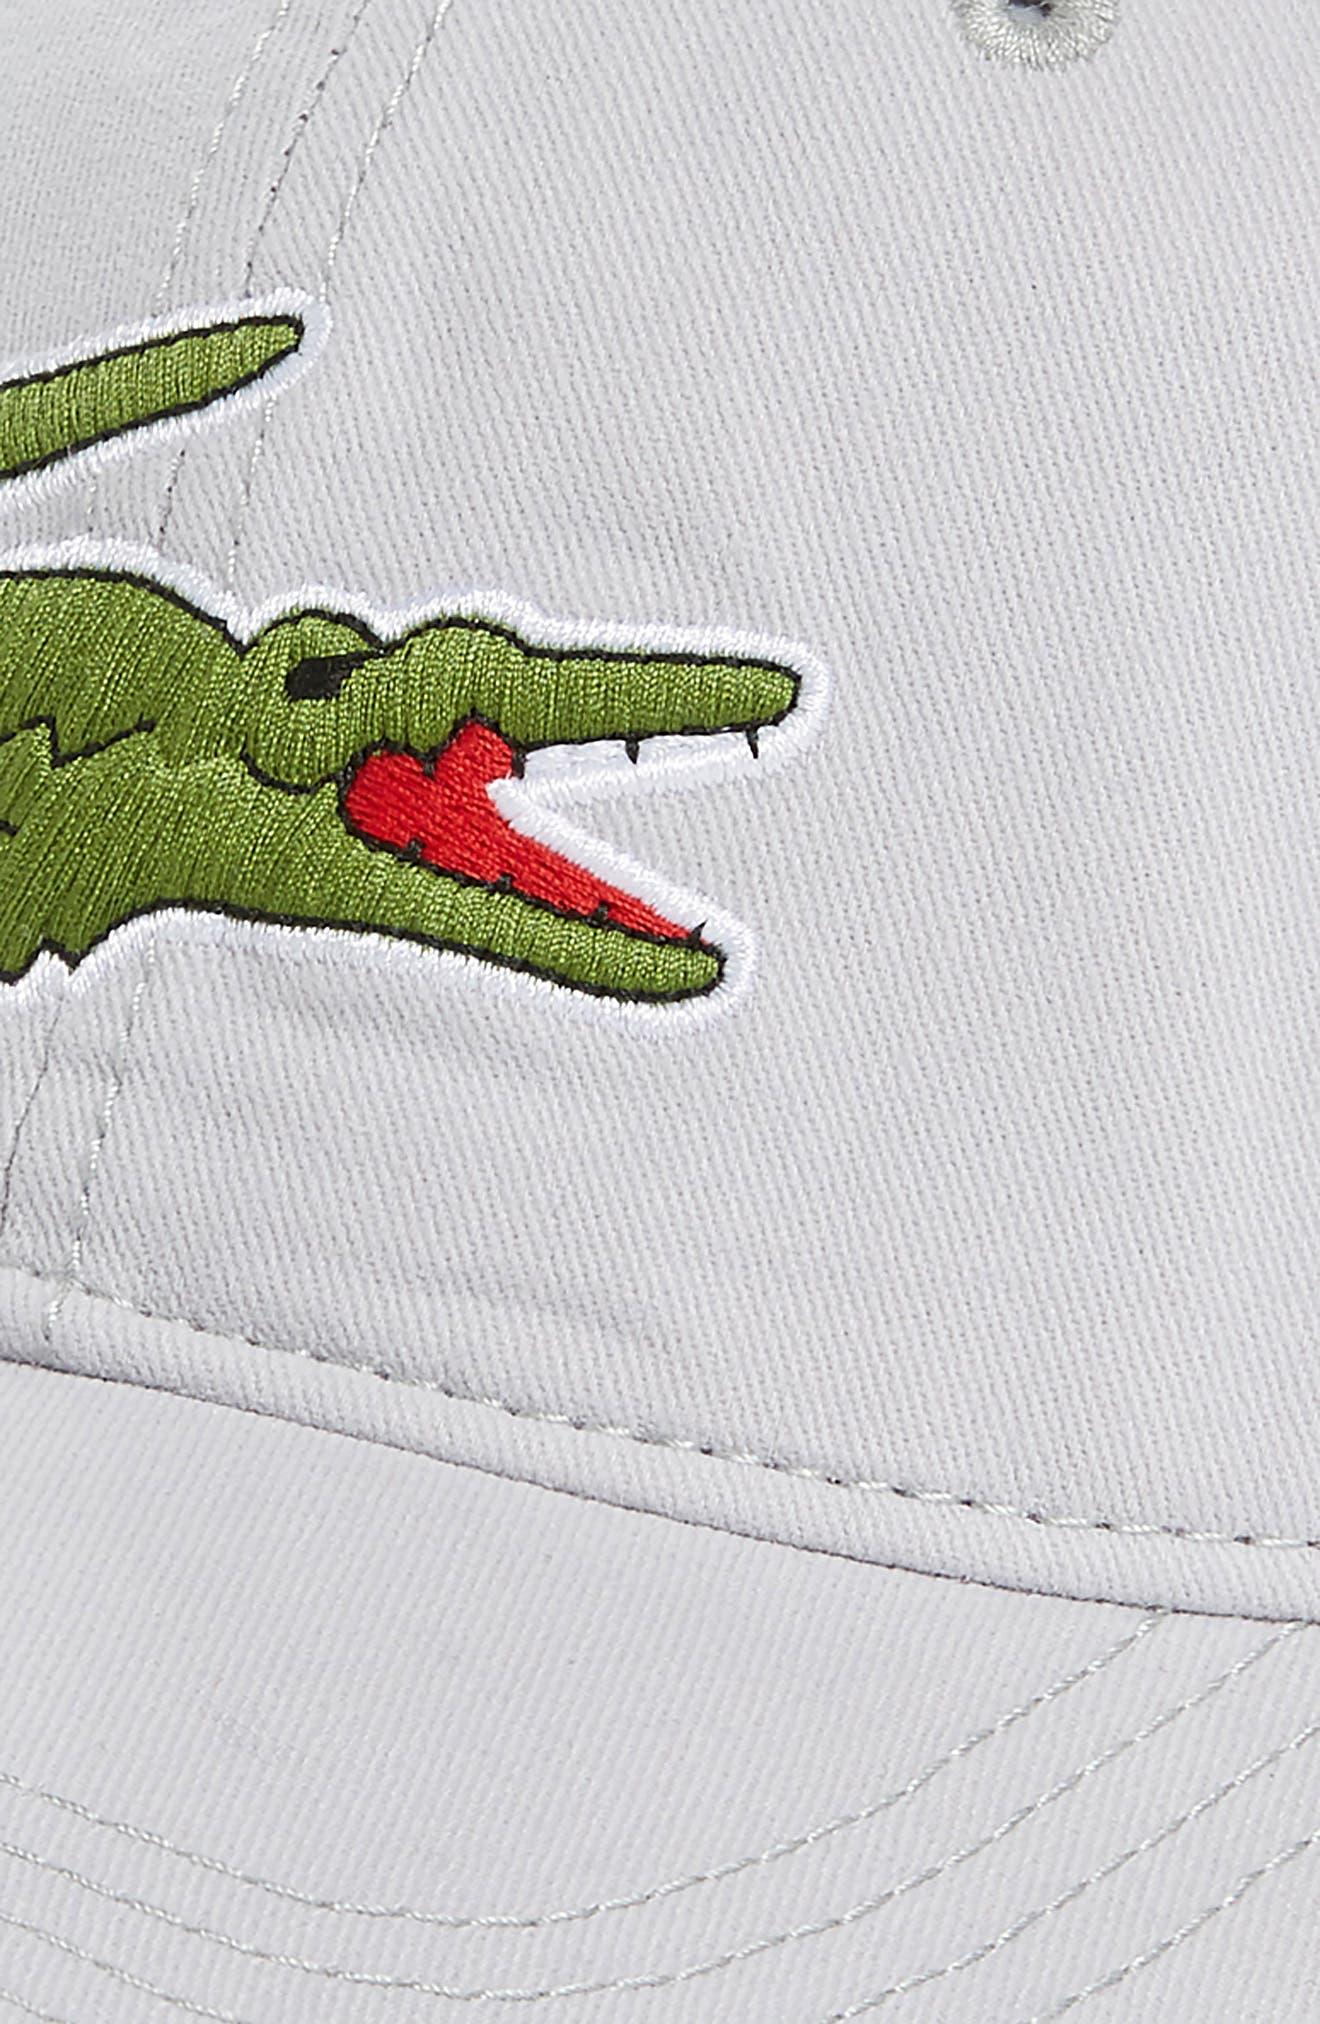 LACOSTE, 'Big Croc' Logo Embroidered Cap, Alternate thumbnail 3, color, 020